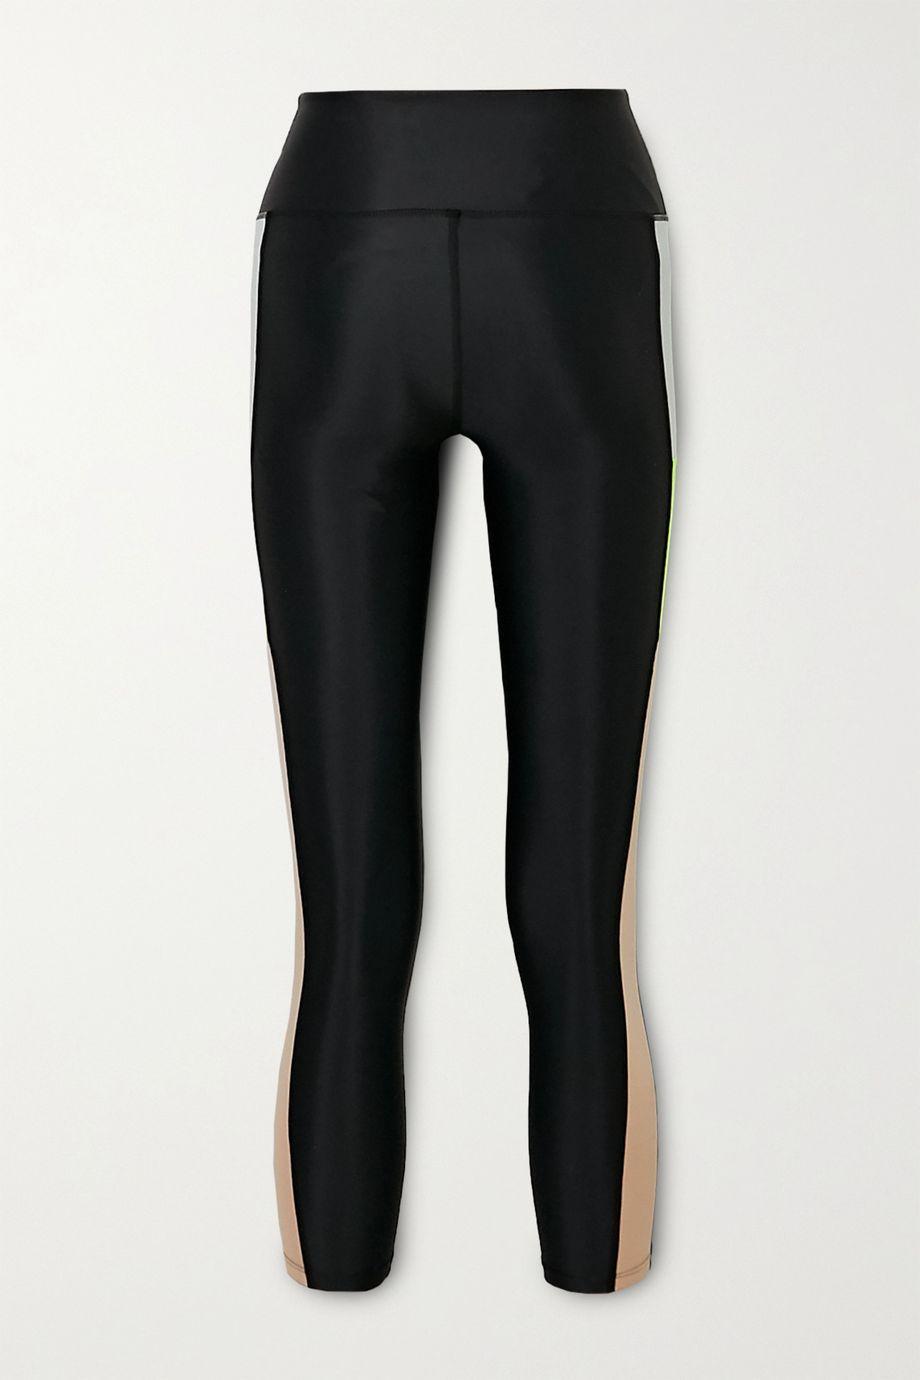 P.E NATION Bar Down printed stretch leggings